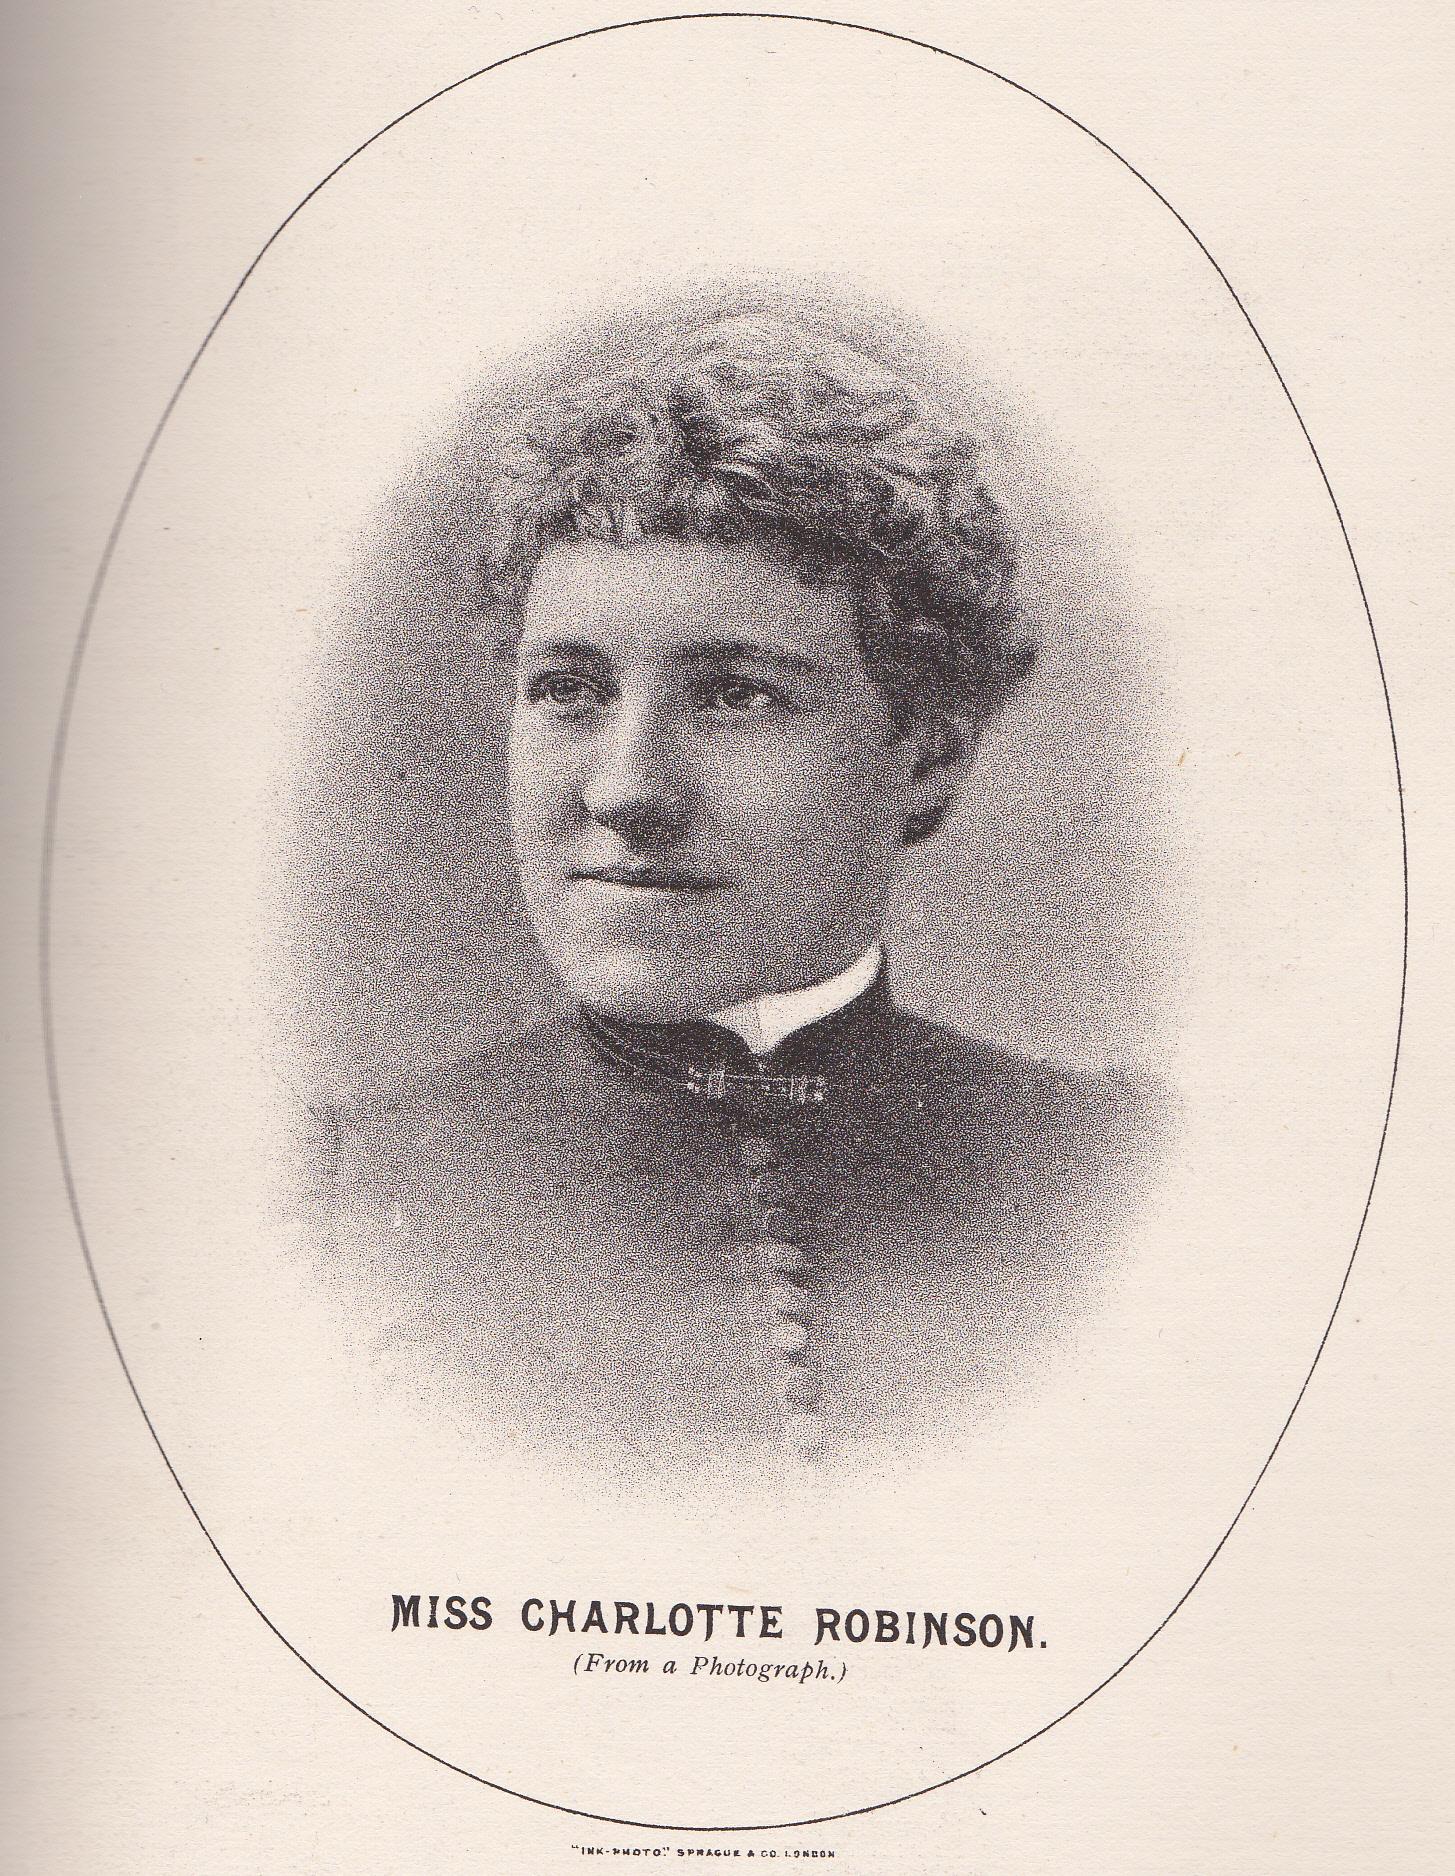 Charlotte Robinson